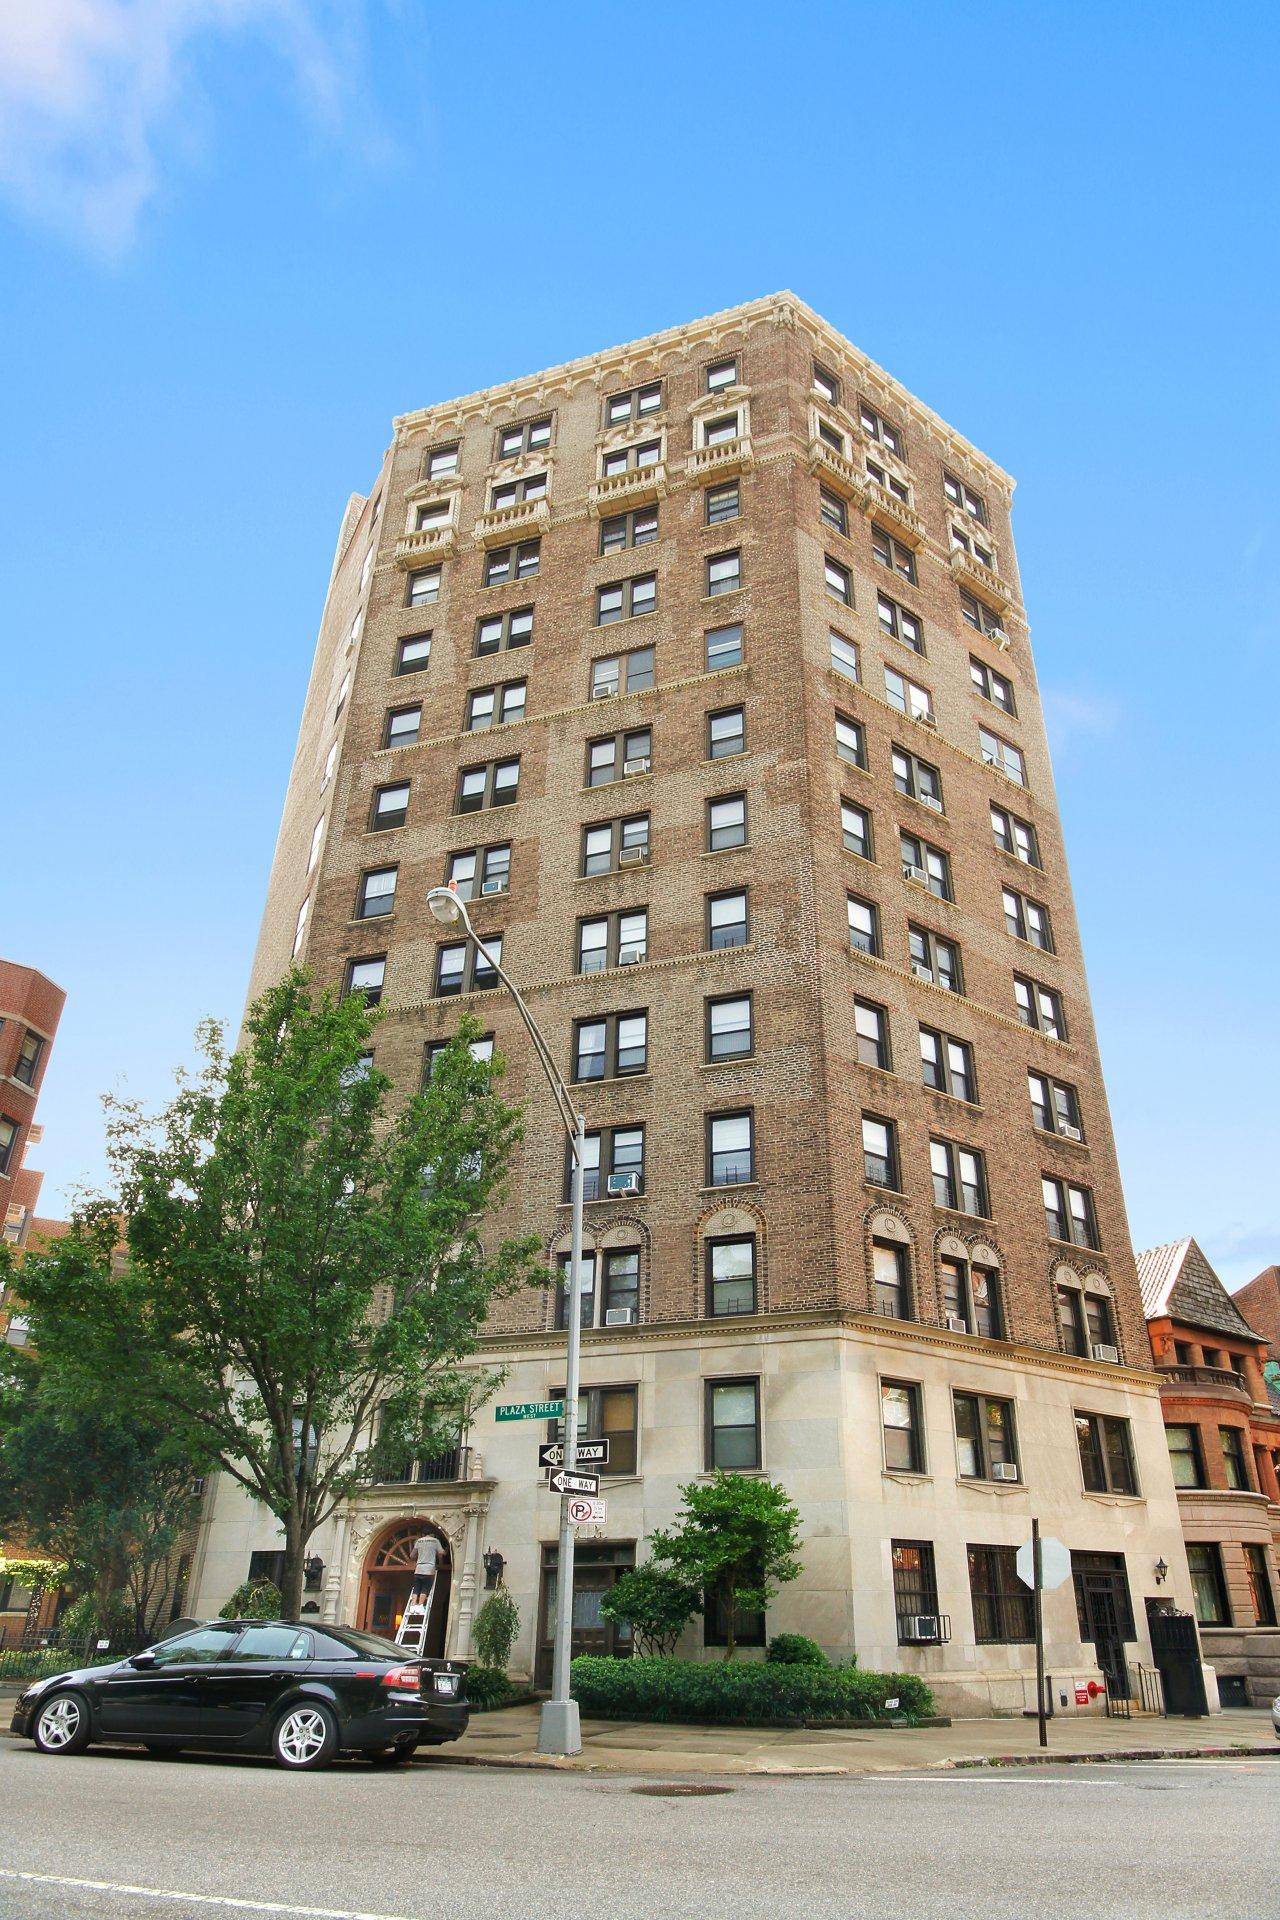 Ad Rental Apartment Brooklyn (11217) ref:5829635